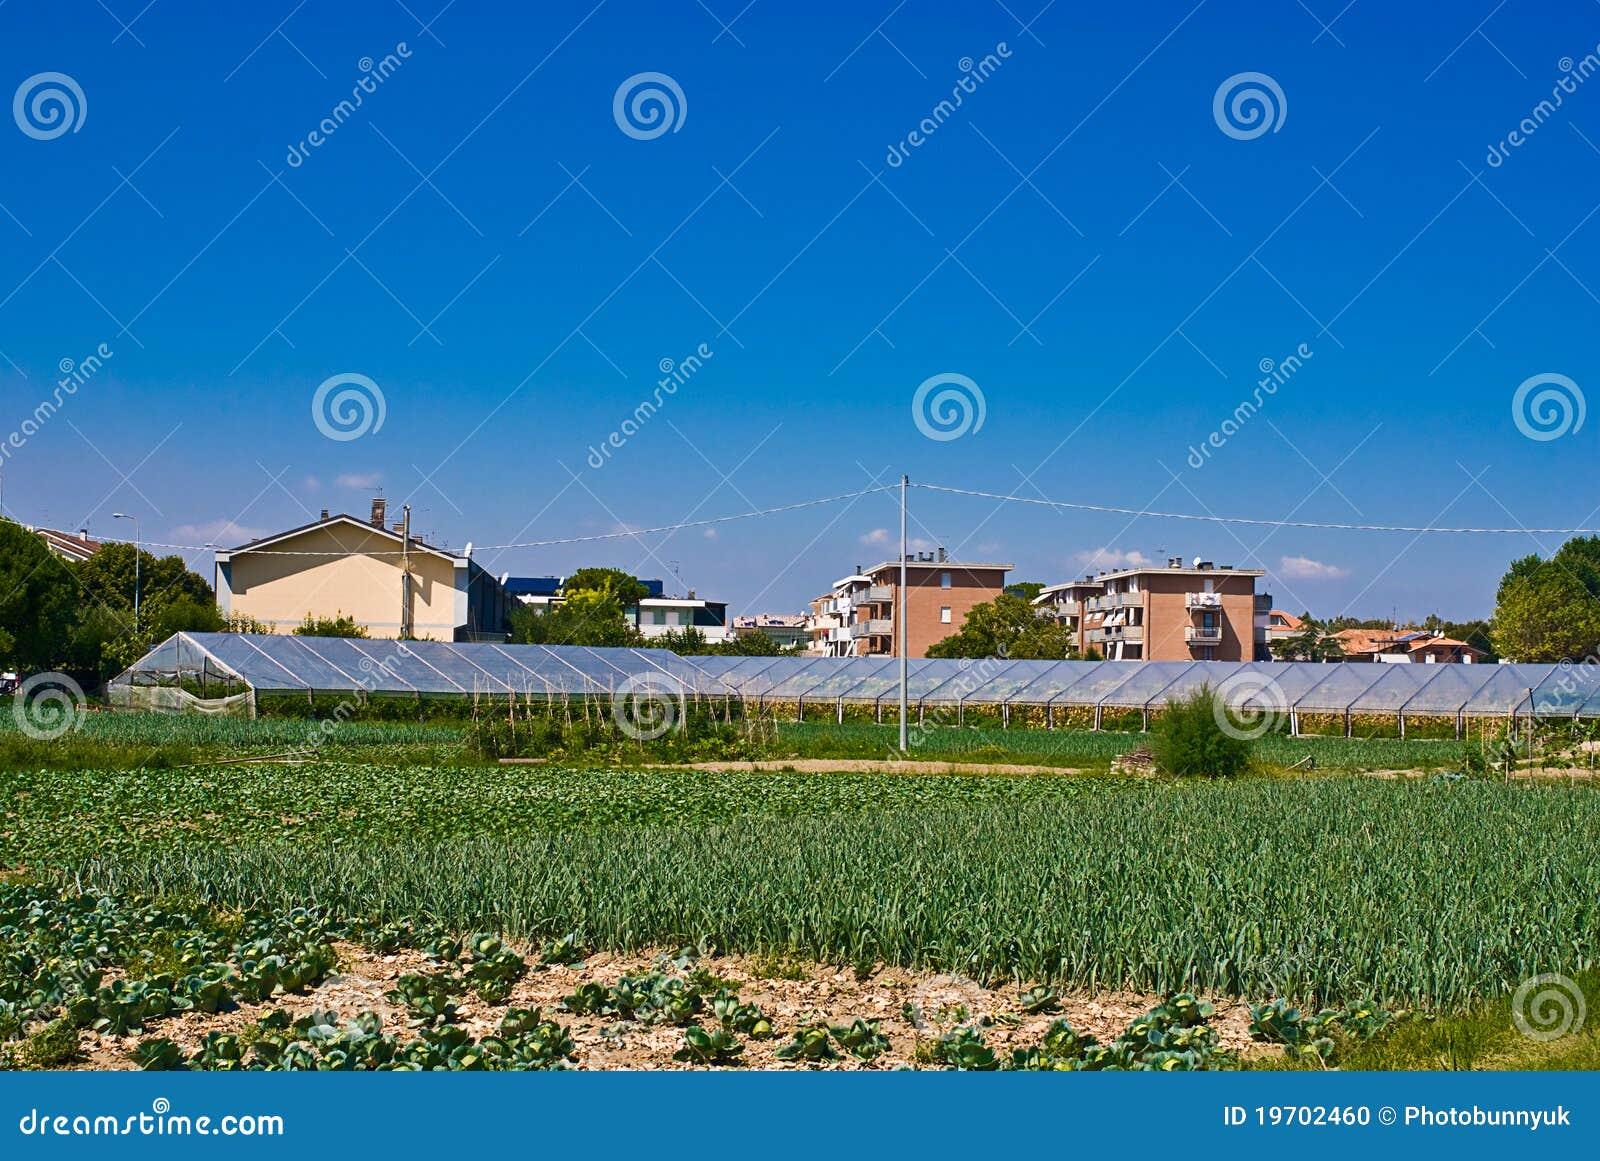 Small Plantation Stock Photo Image Of Vegetable